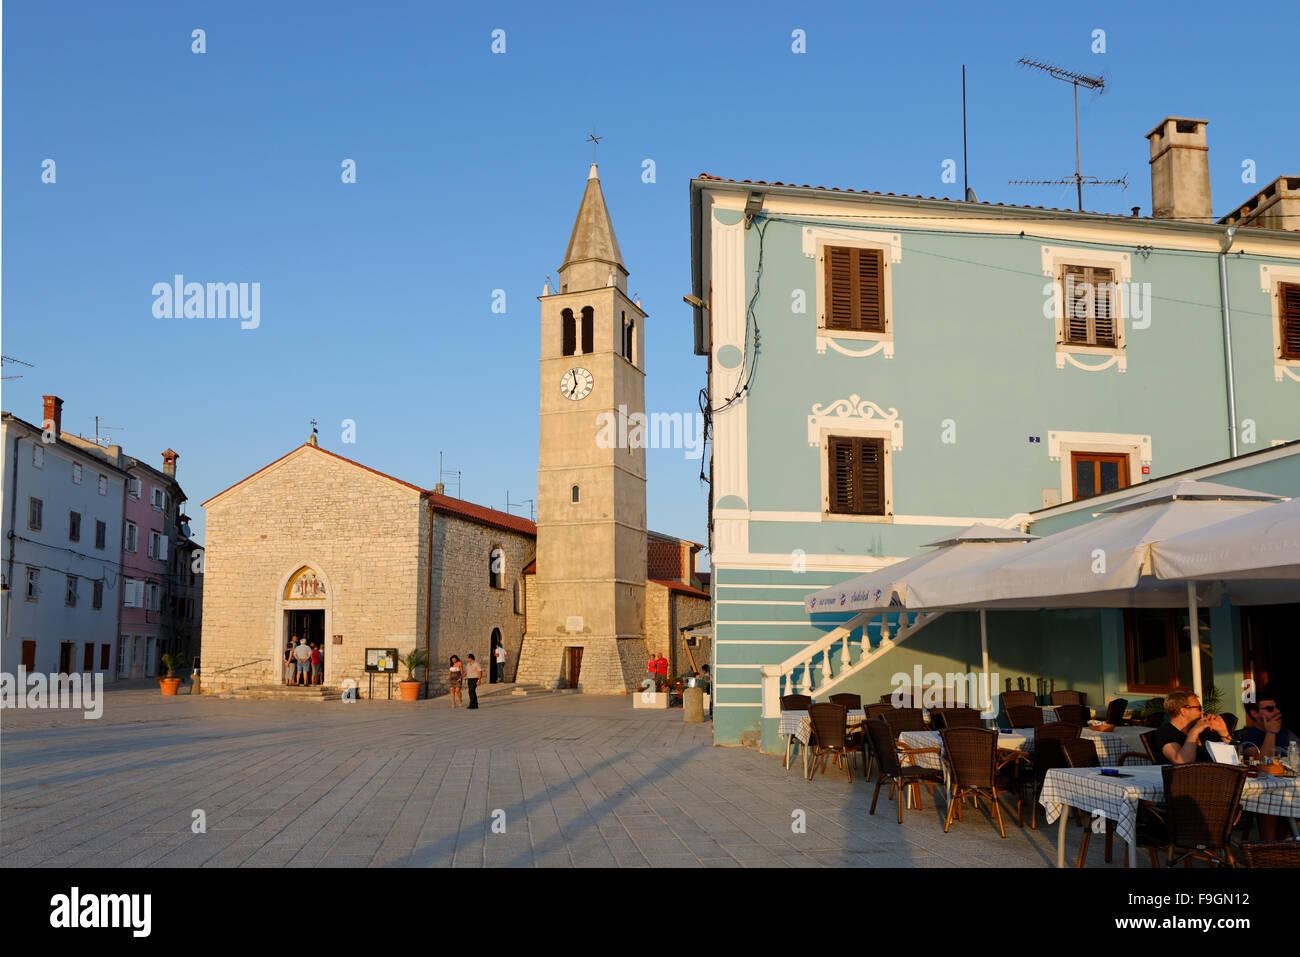 St. Cosmas und Damian parish church, Fažana, Fasana, Istria, Croatia - Stock Image